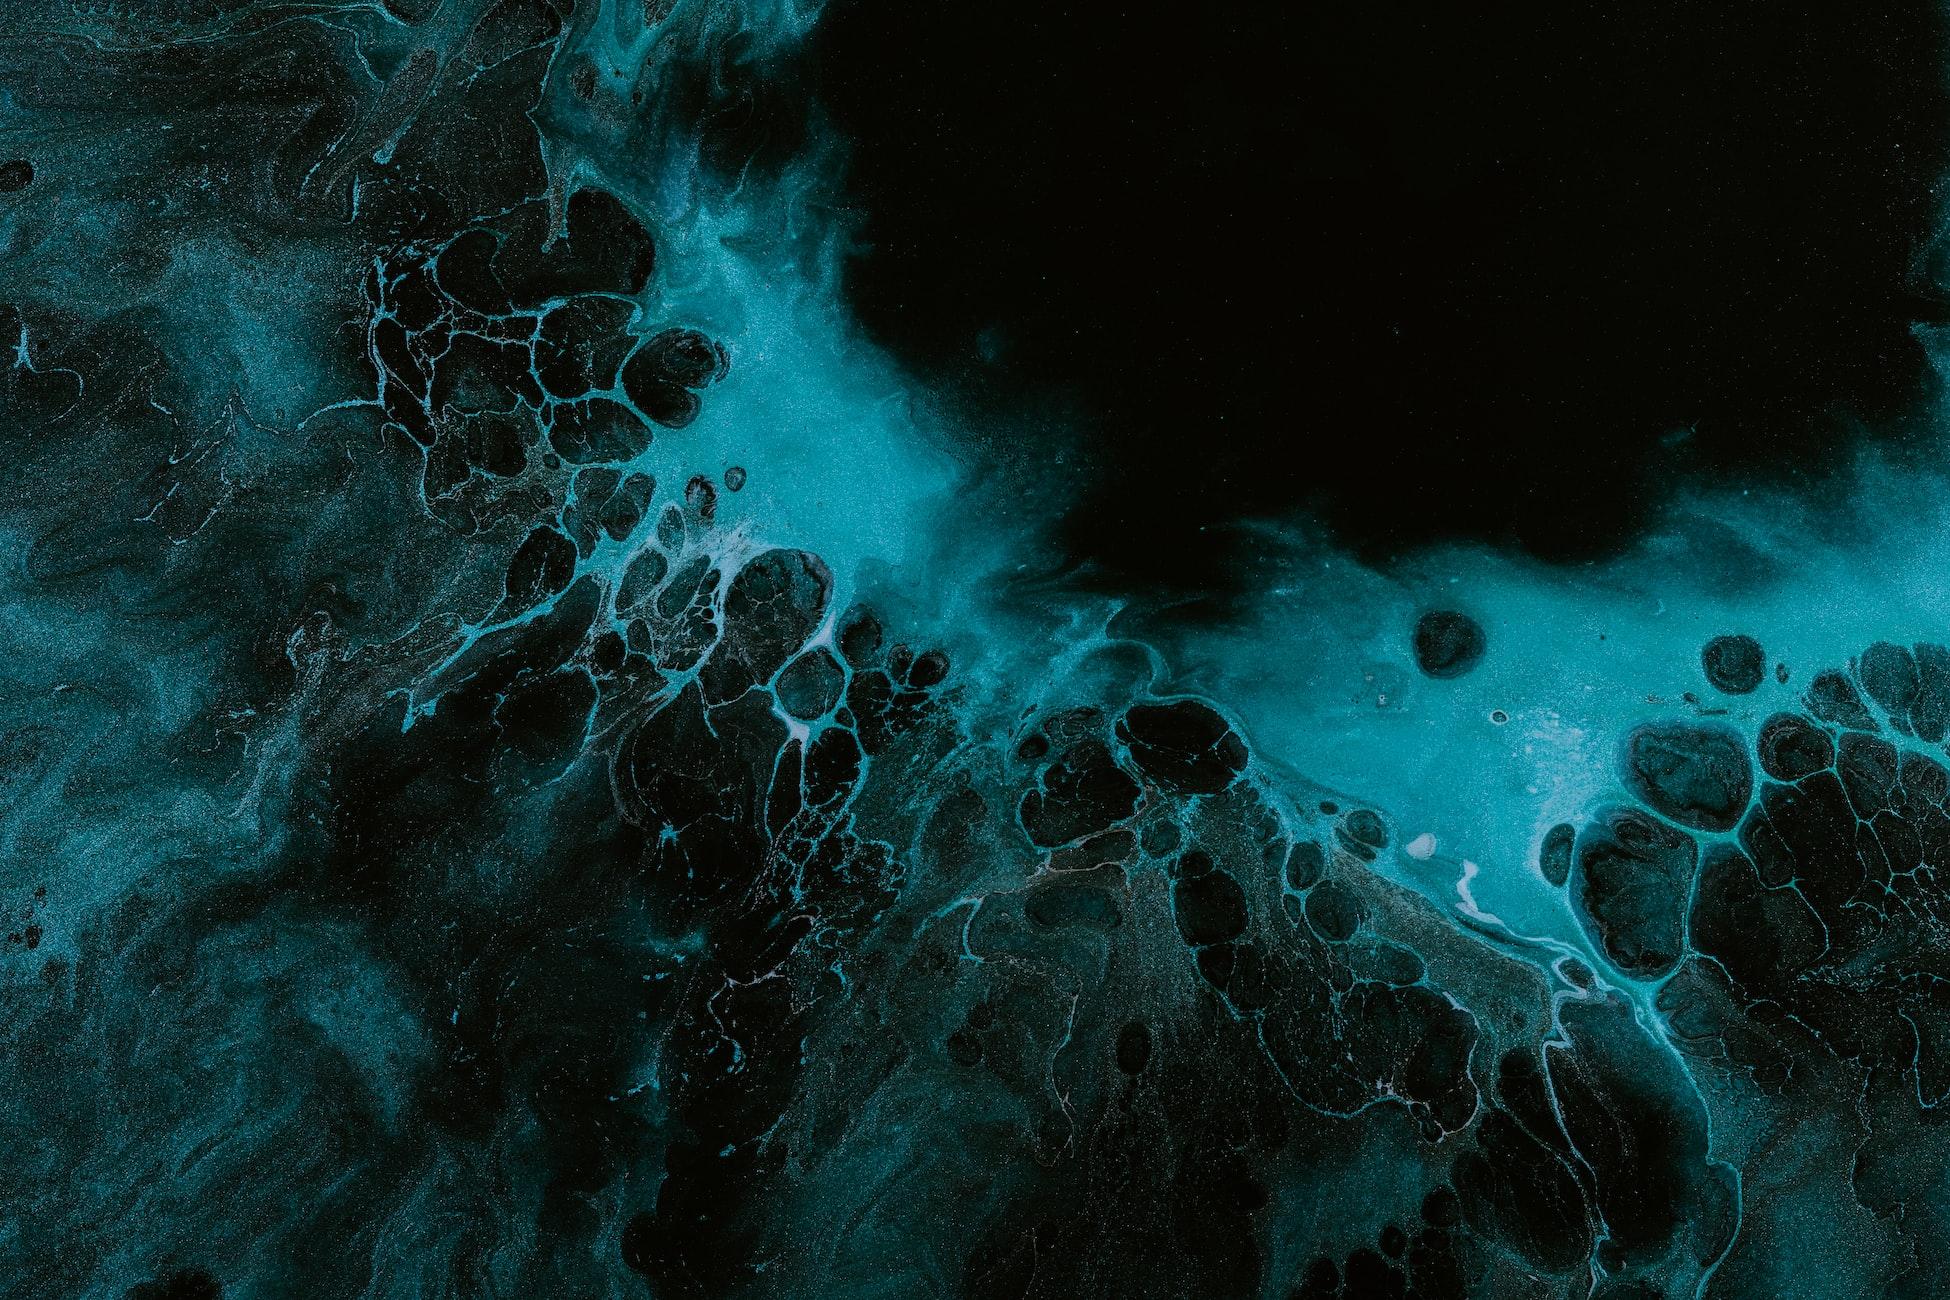 Insomnia: Cauze și tratament